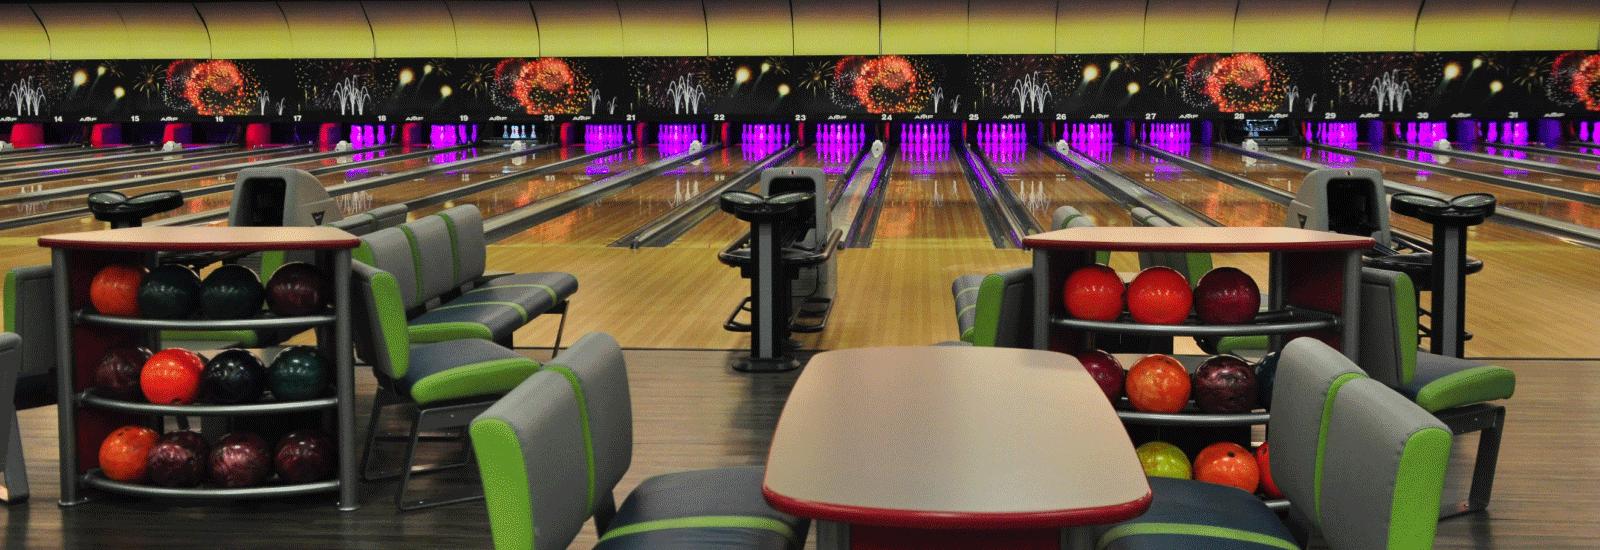 Redstone Arsenal Bowling Alleys